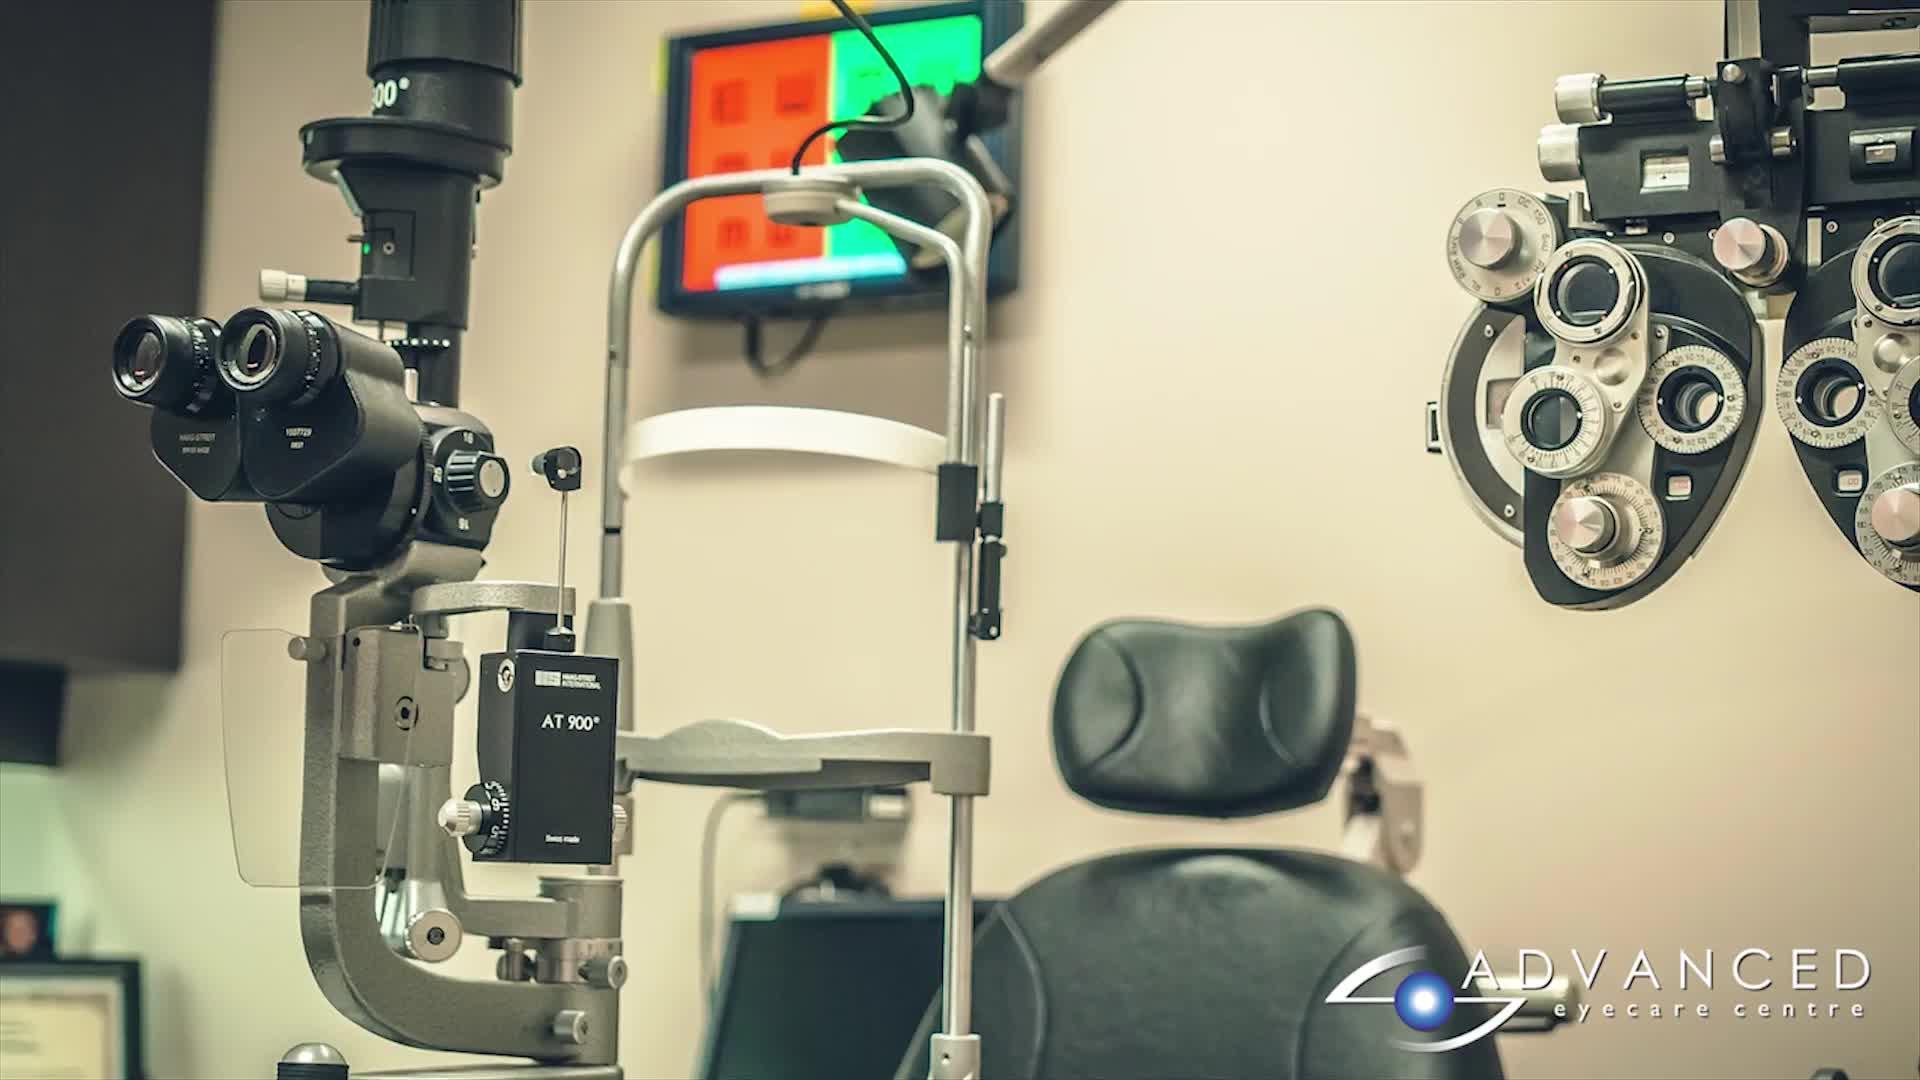 Advanced Eyecare Centre - Eyeglasses & Eyewear - 403-233-0405